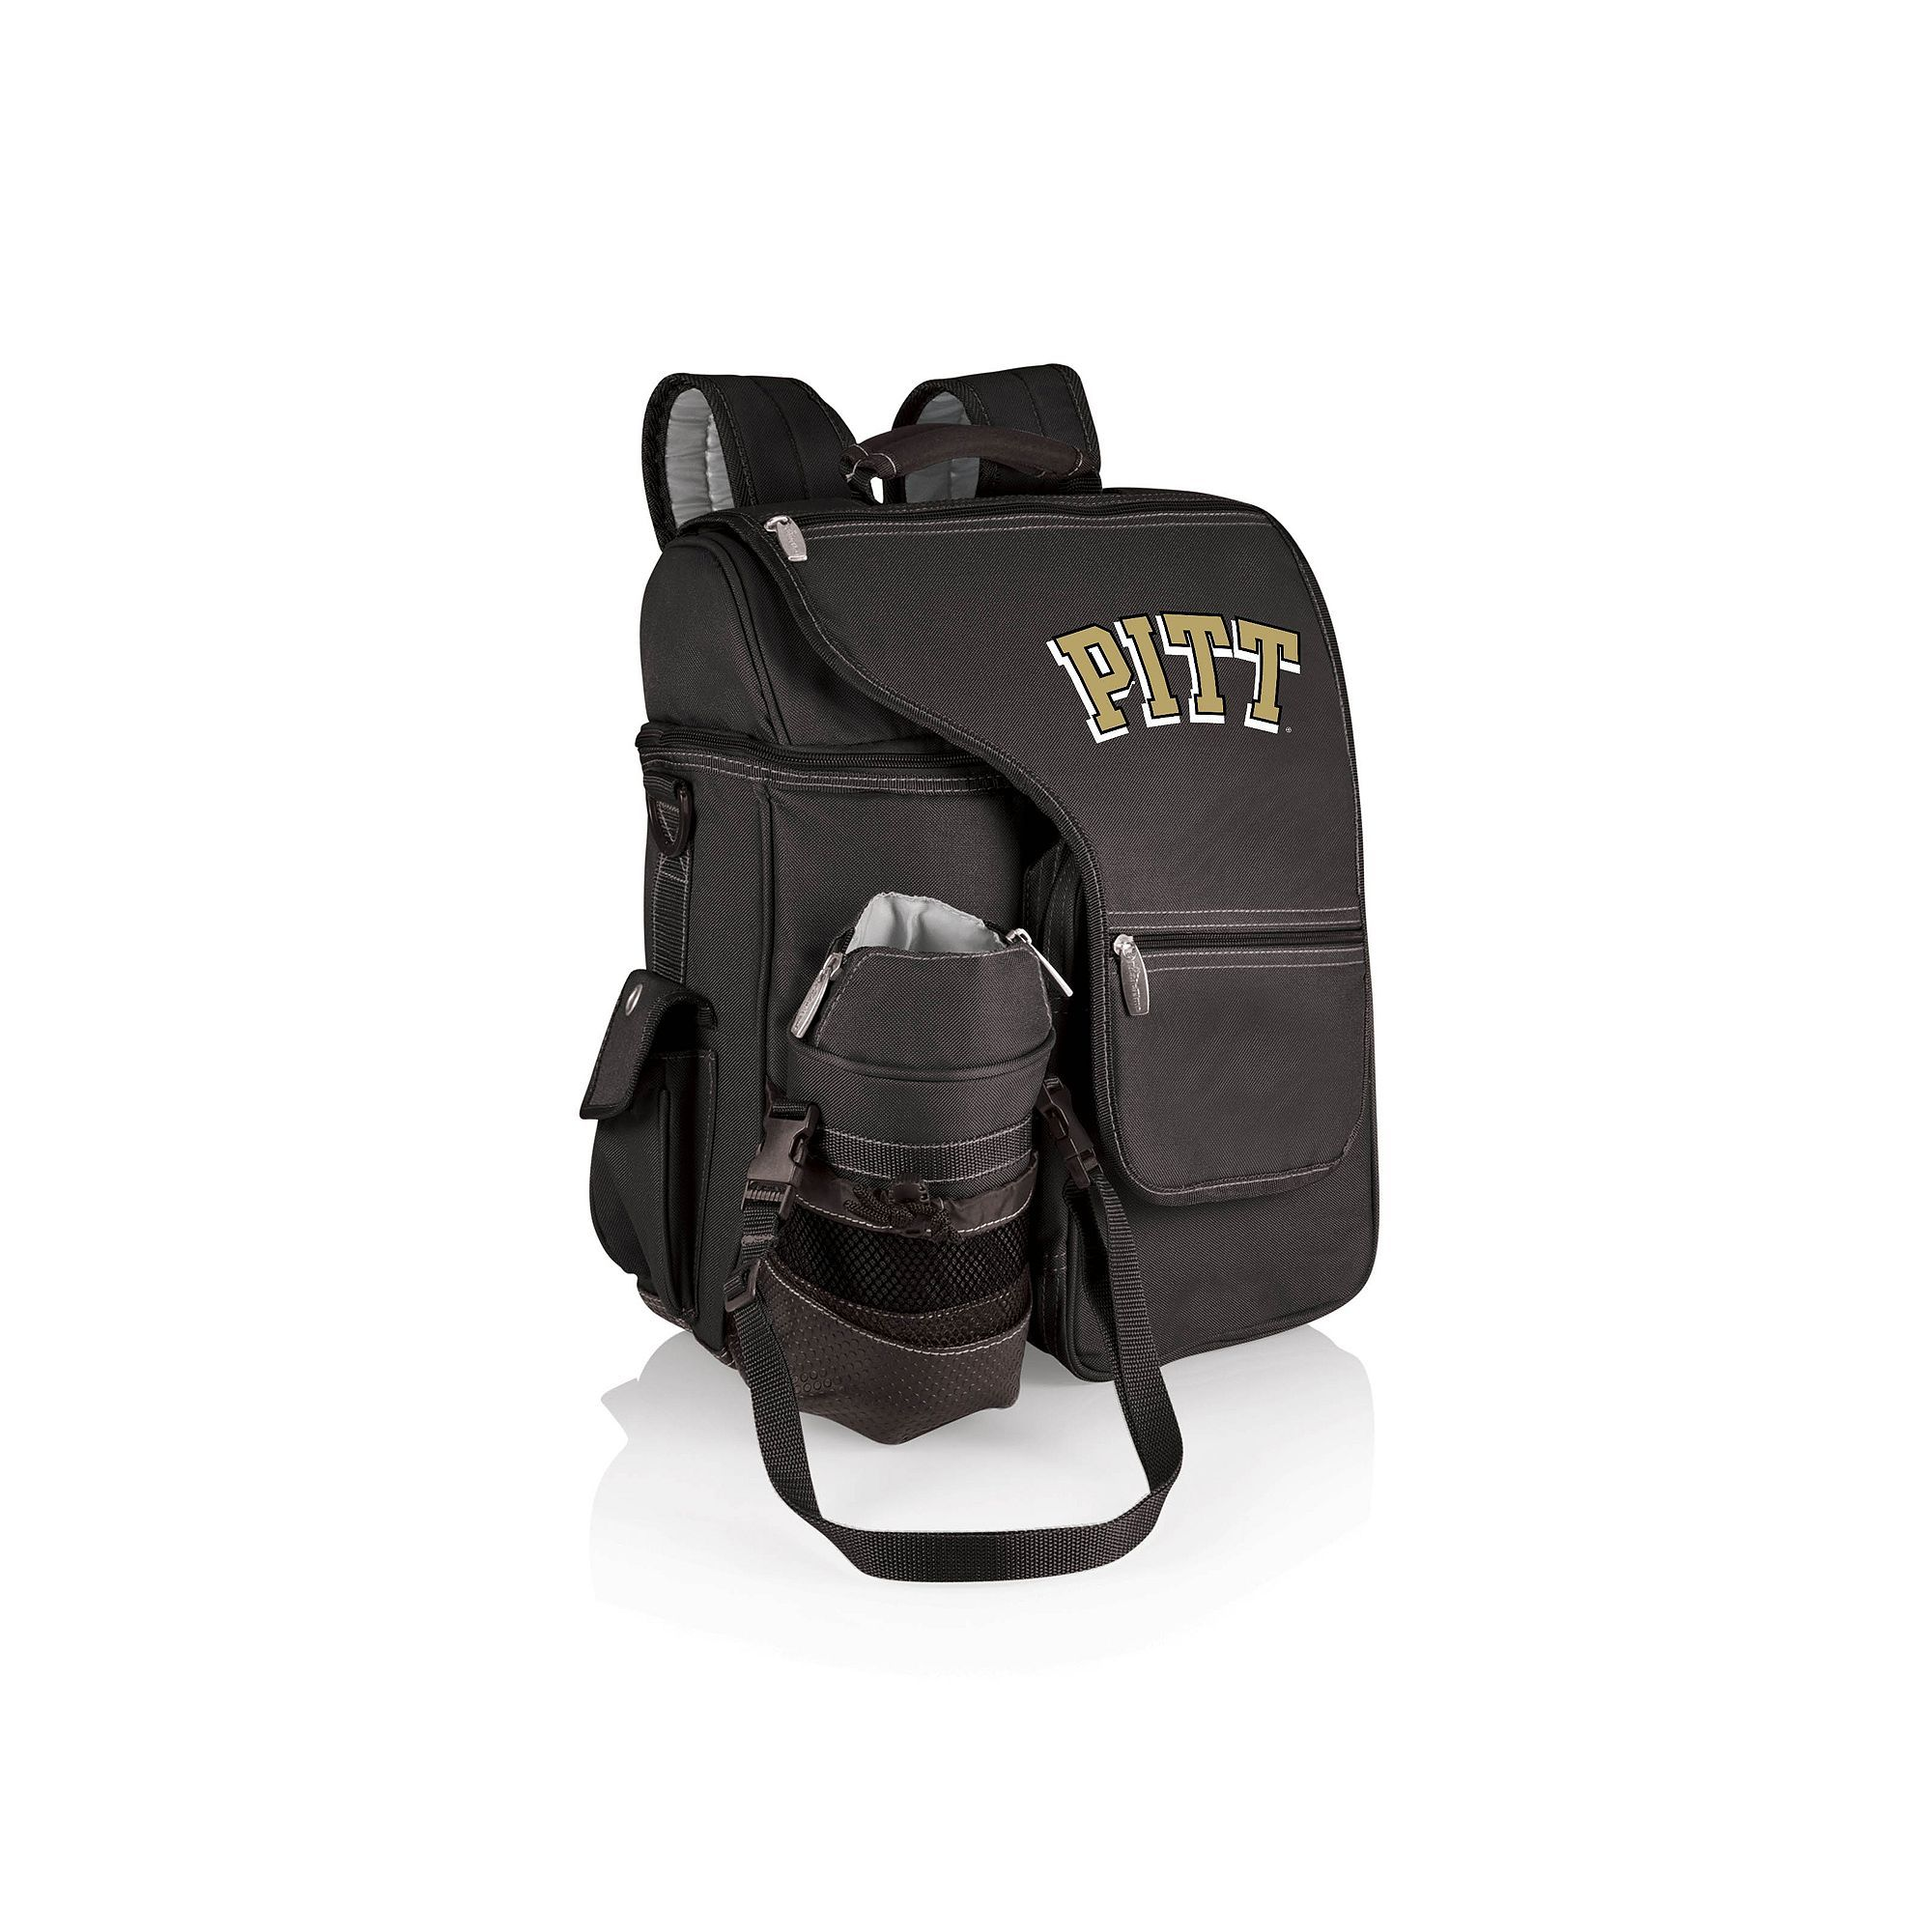 731d18e1e8 Tourit Insulated Backpack Cooler Bag- Fenix Toulouse Handball